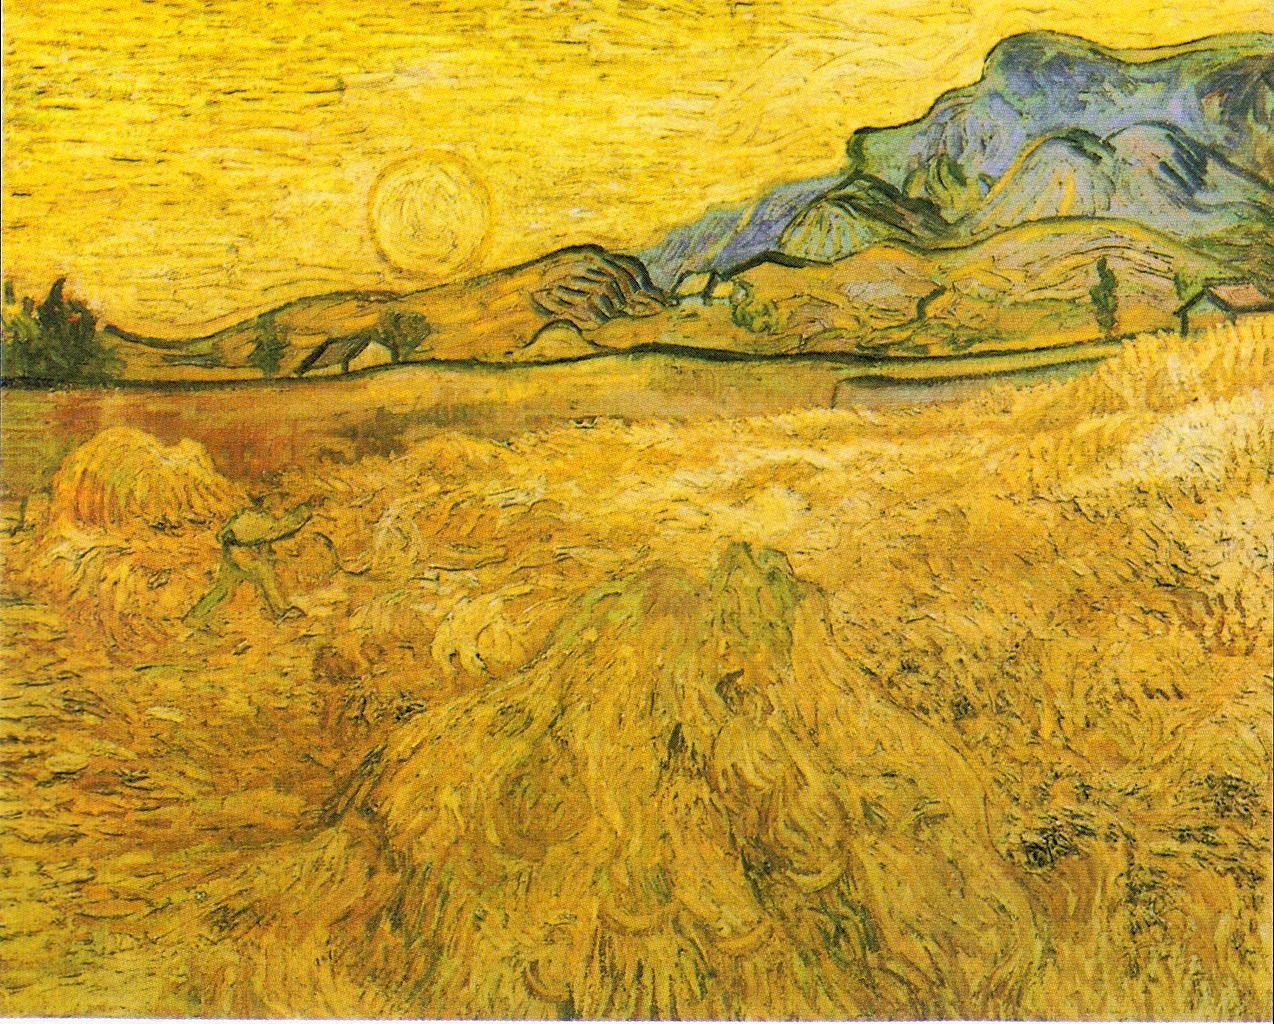 "风景油画_麦田里有收割者和阳光(亦称""收割者围地"")_Wheat Field with Reaper and Sun(also known as 'Enclosed Field with Reaper')-文森特·梵高"